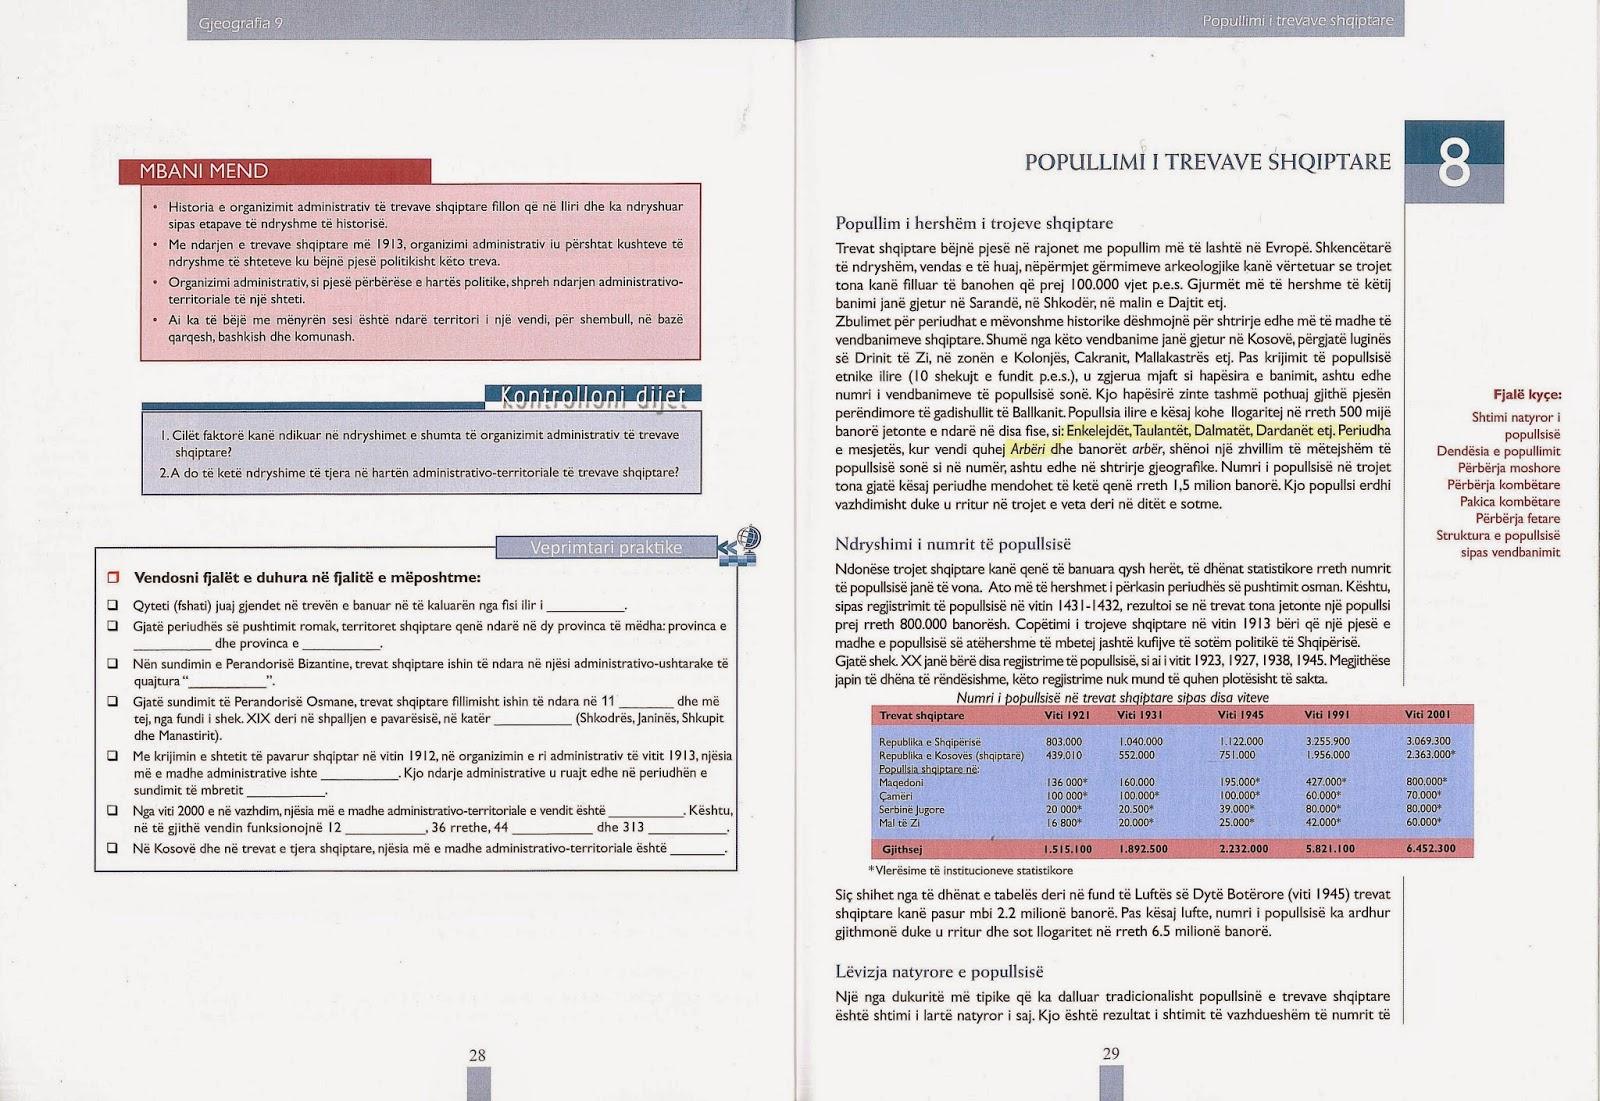 GJEOGRAFIA 9 σελ 28-29